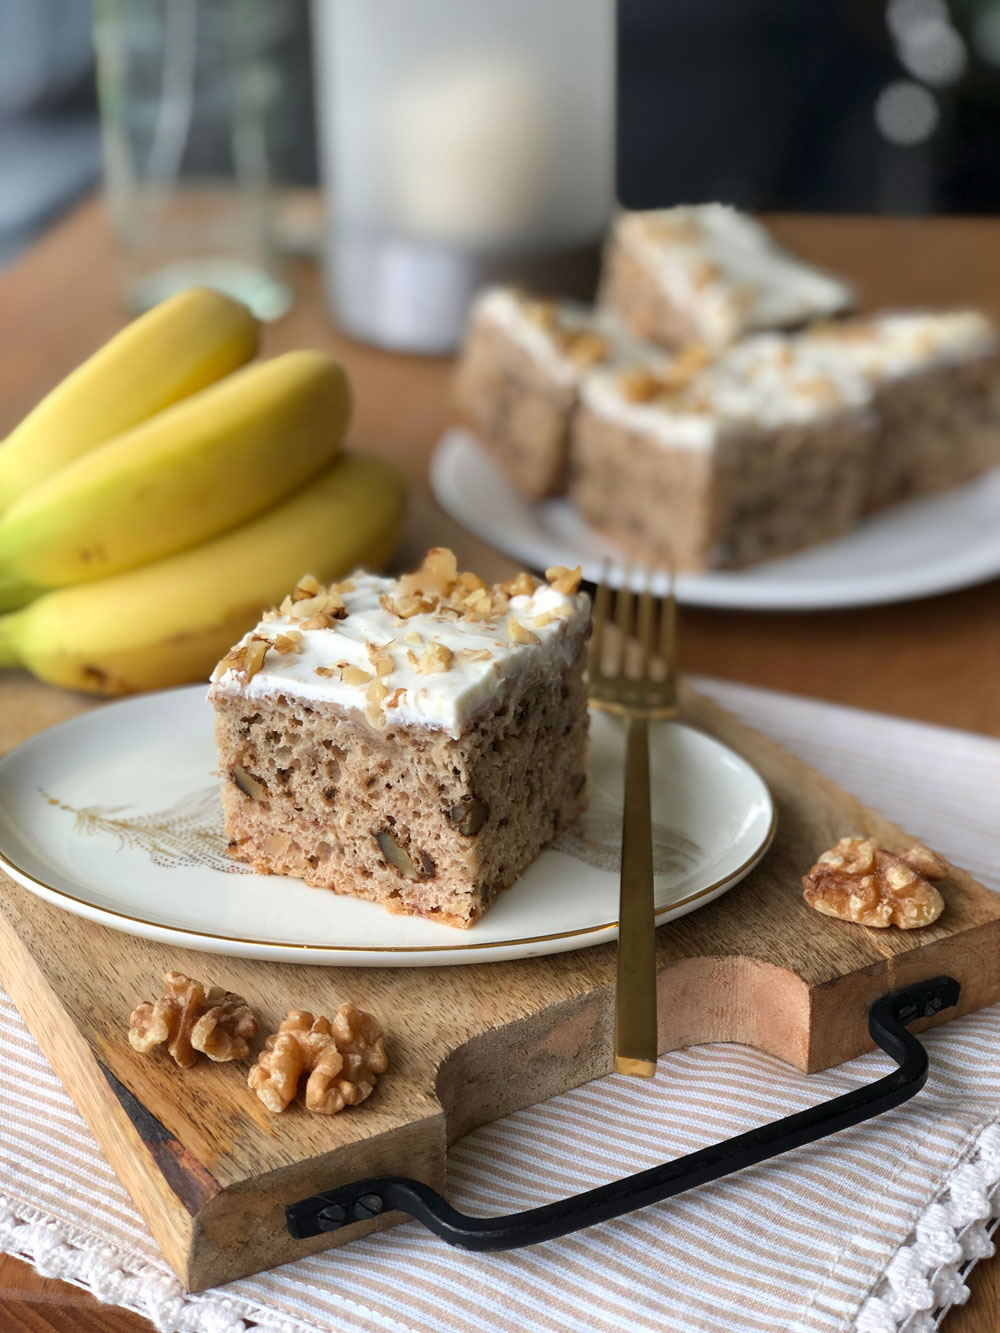 Banana Nut Bread (Bananenbrot)